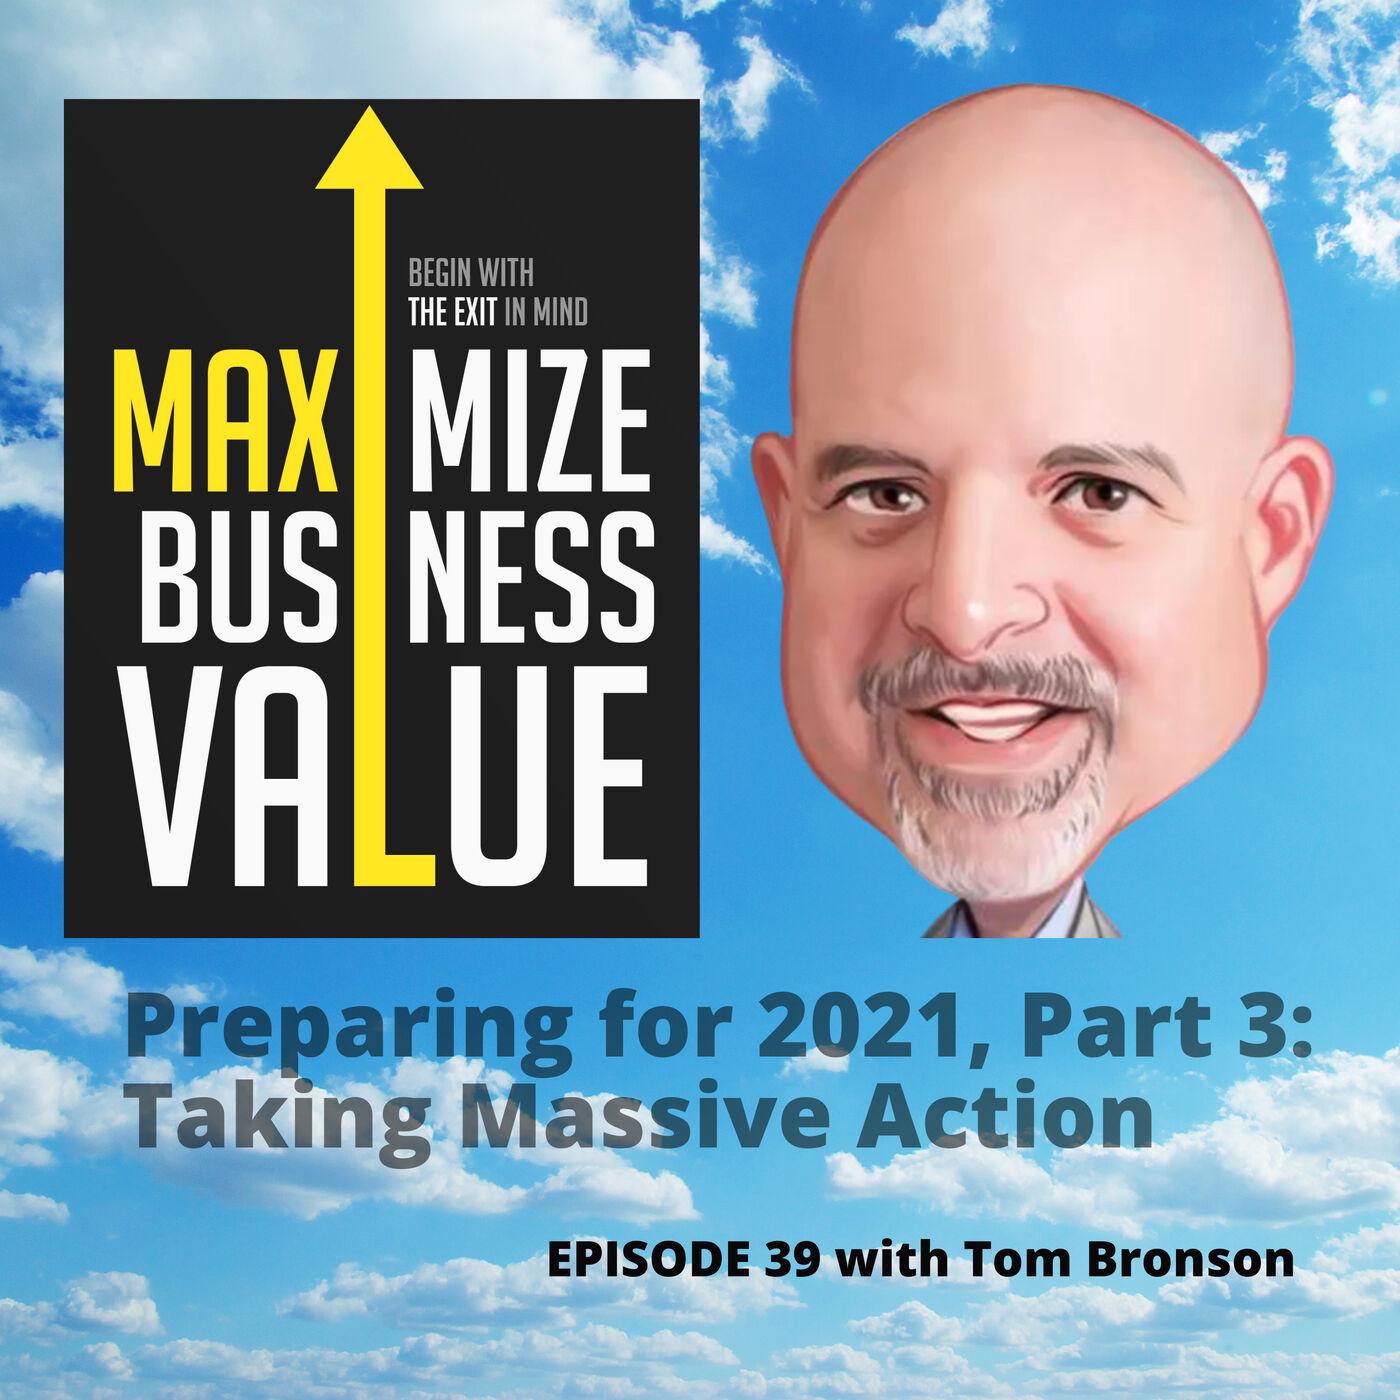 Preparing for 2021, Part 3: Taking Massive Action